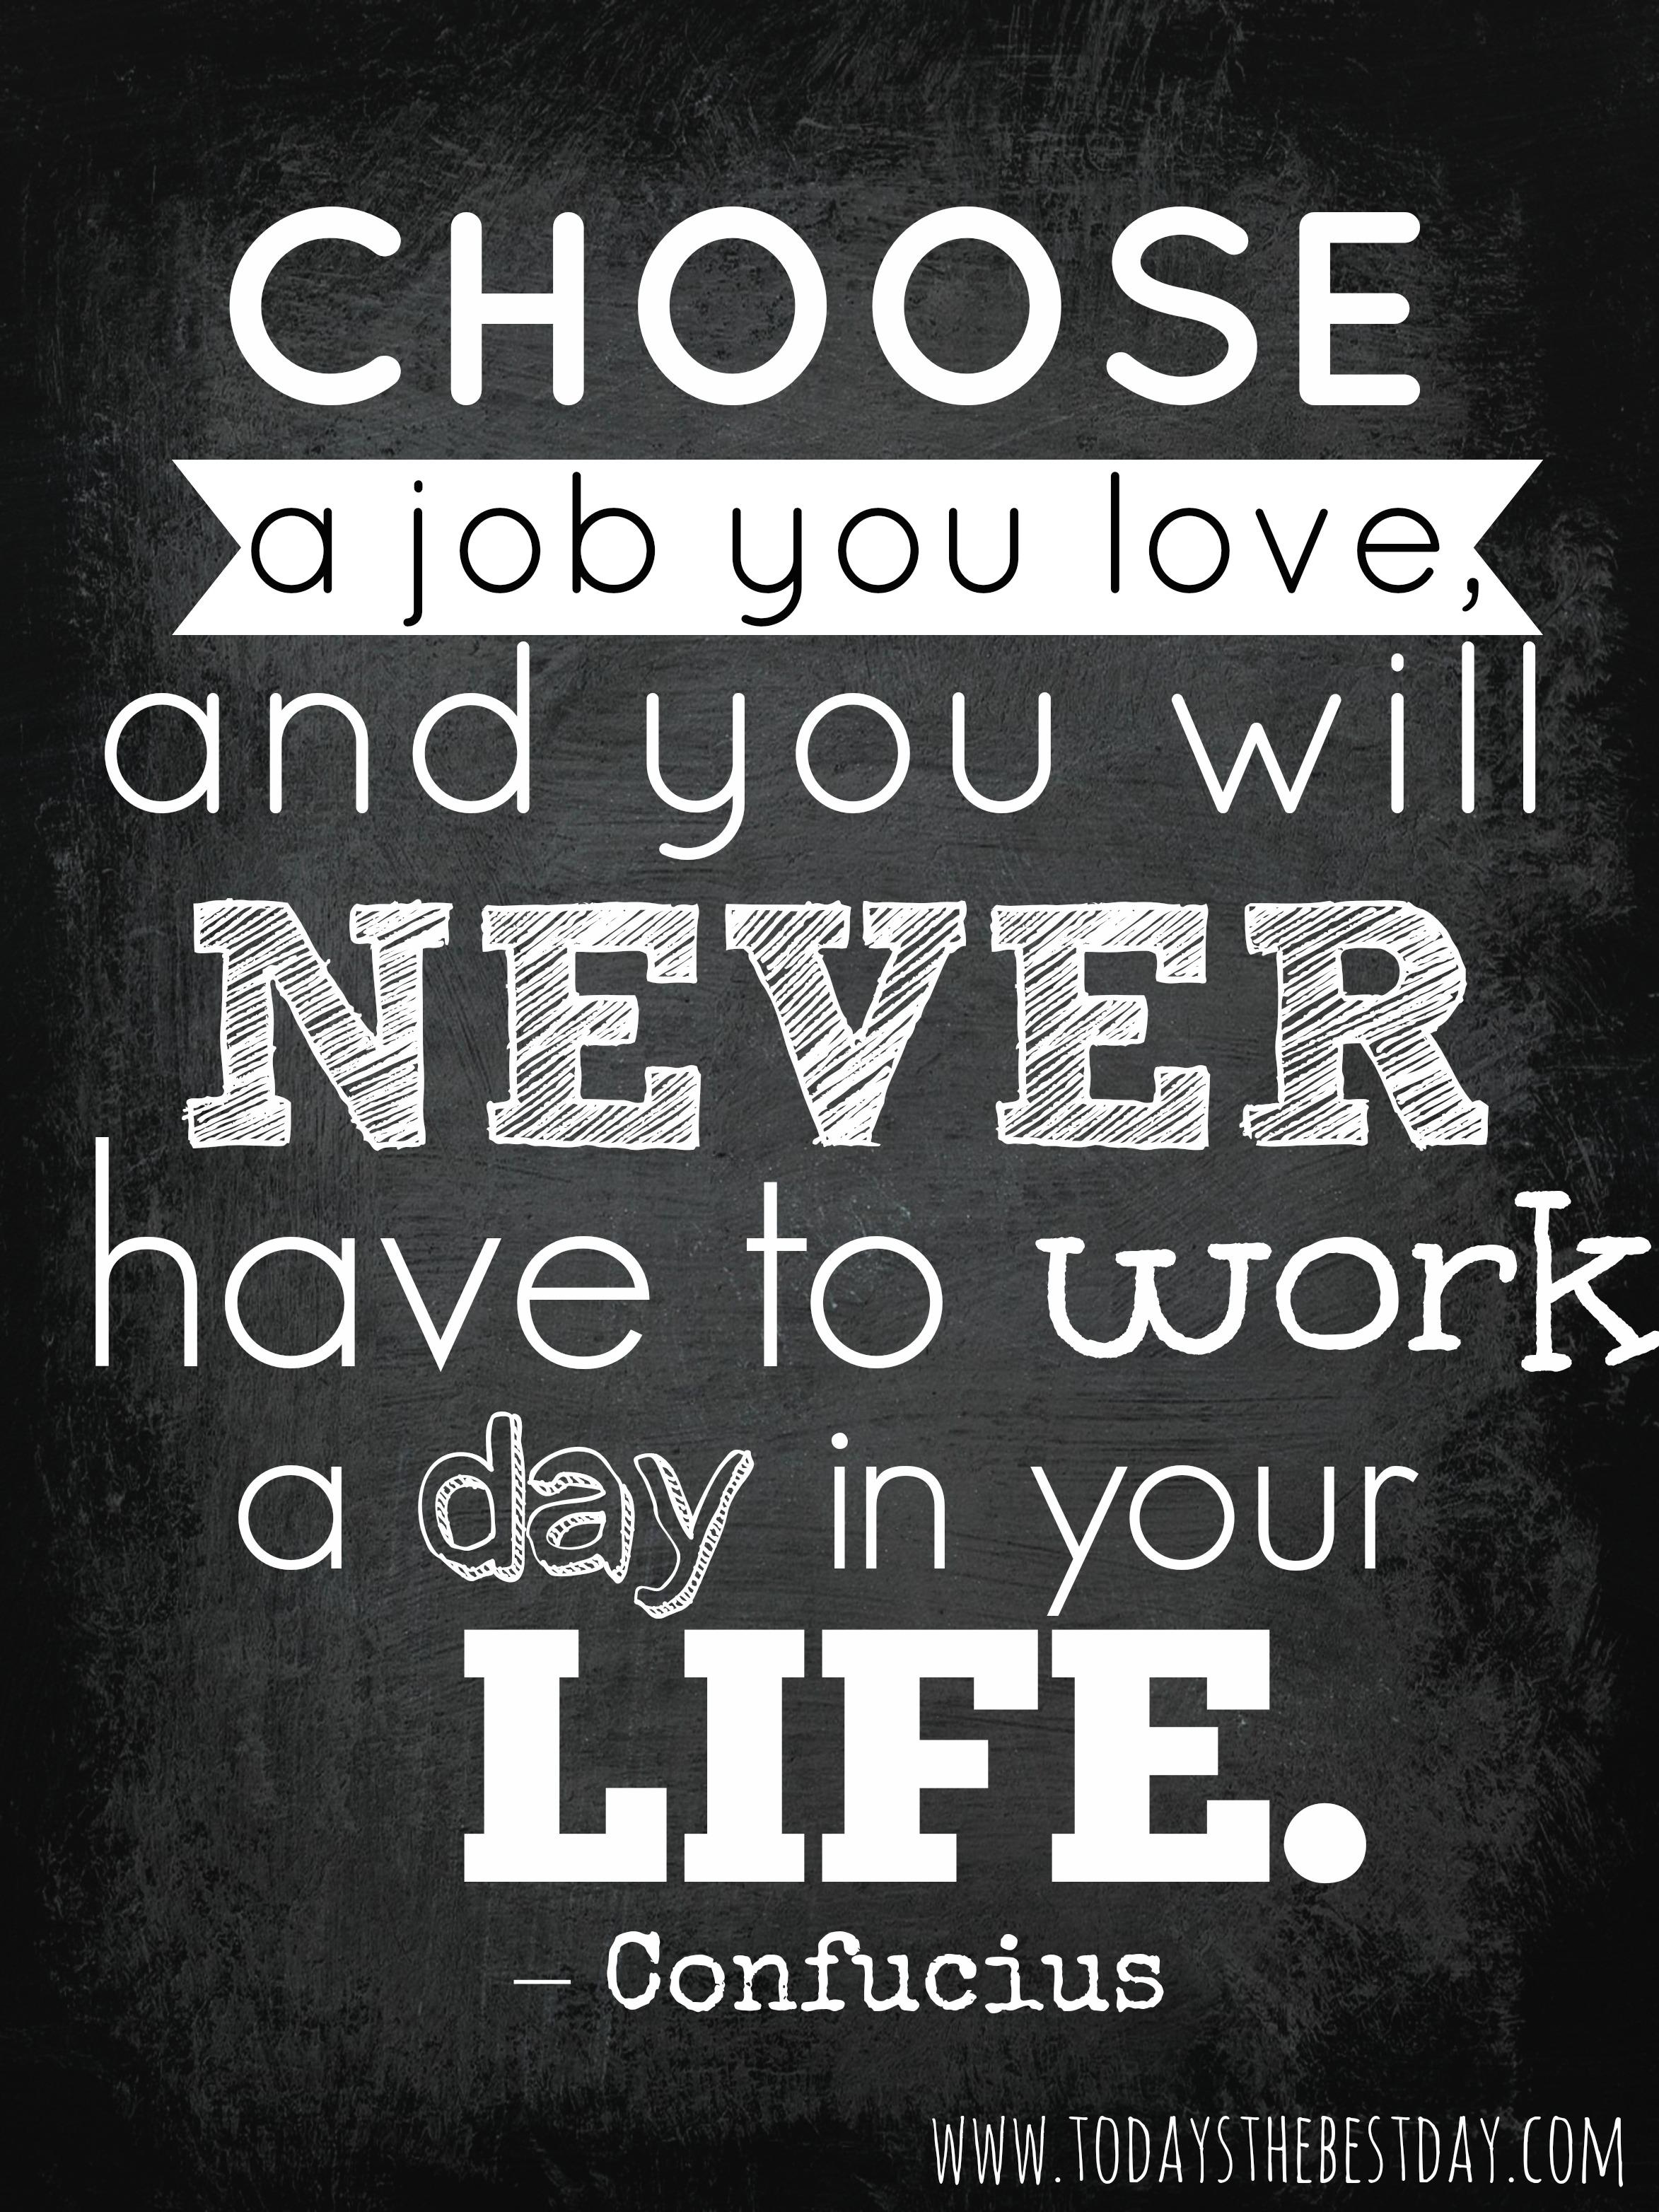 https://i1.wp.com/www.todaysthebestday.com/wp-content/uploads/2014/04/Choose-a-job-you-love.jpg